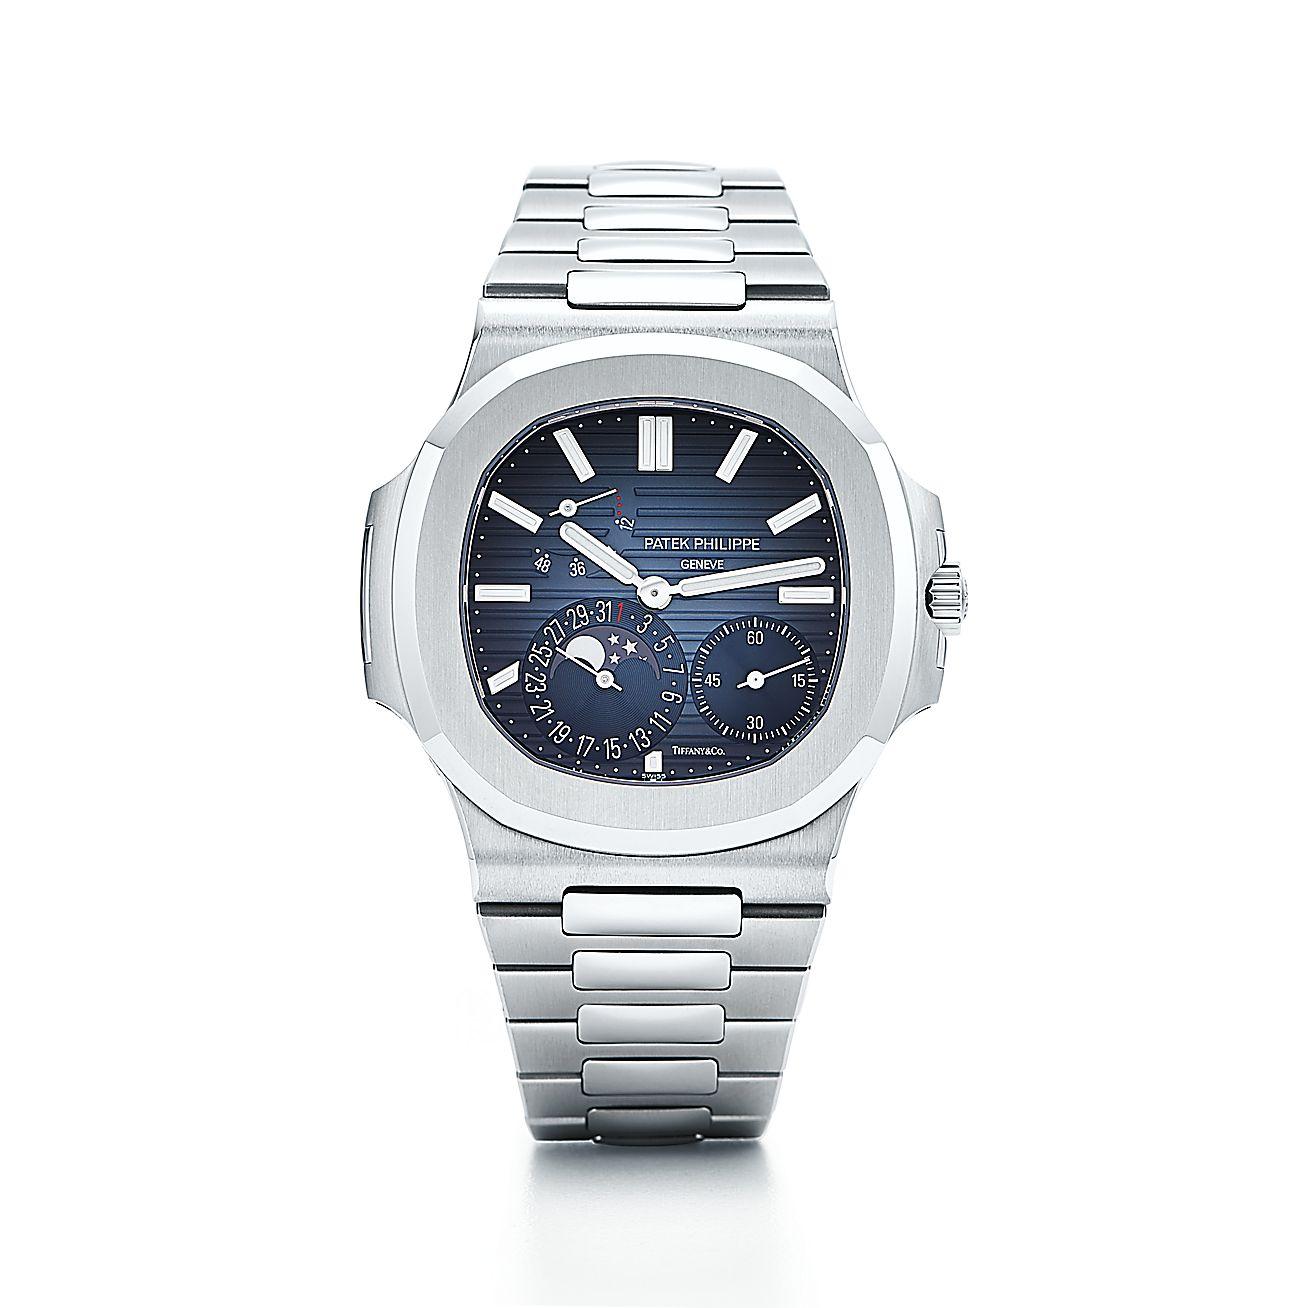 Patek Philippe Nautilus Watches For Sale